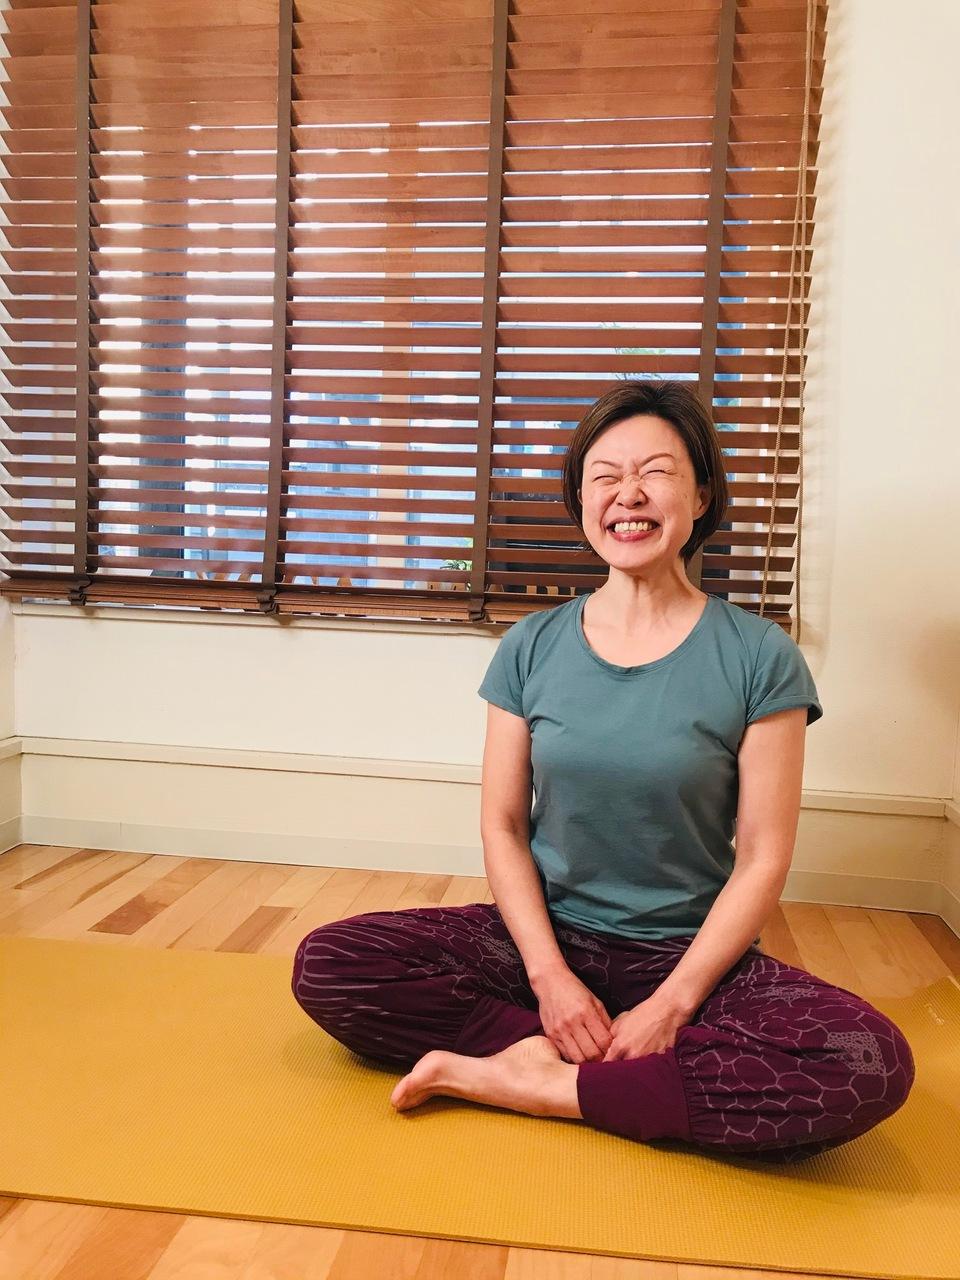 Online : ゆっくり軸を感じるハタヨガ 講師:宮川幸